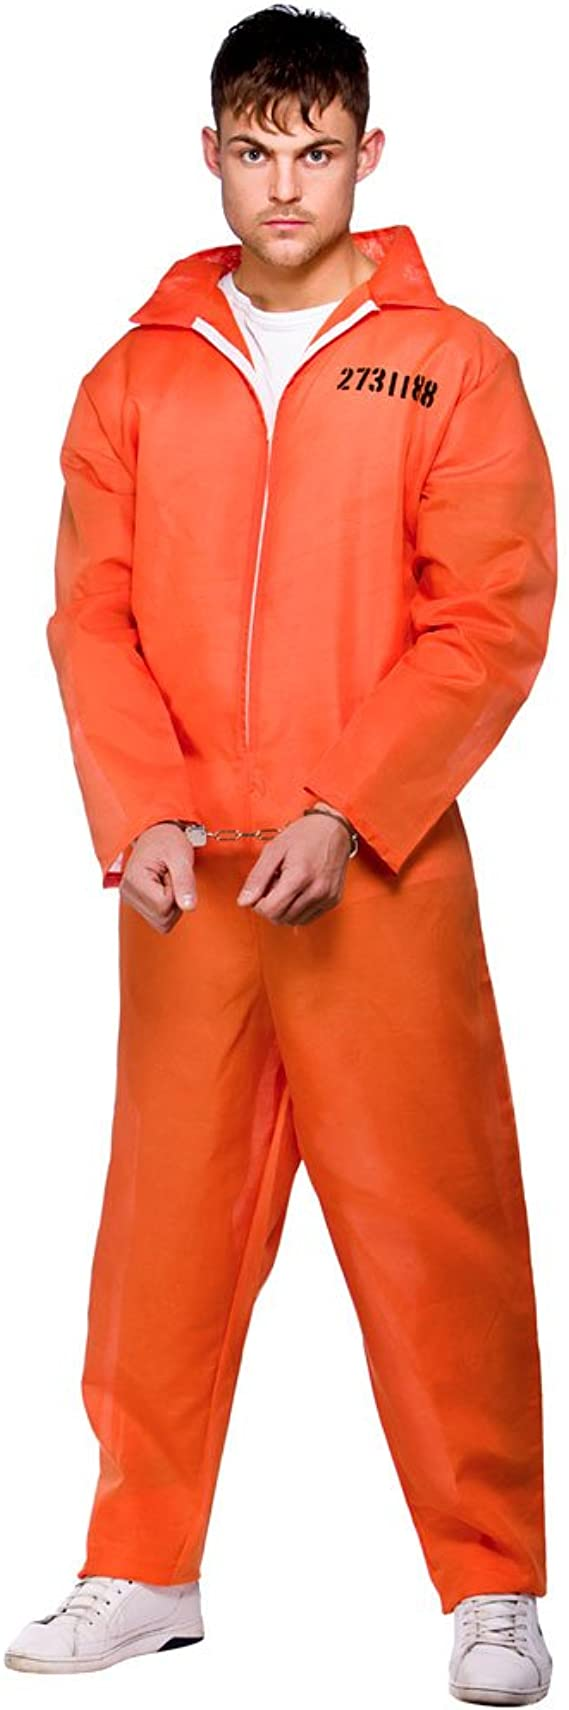 MENS ORANGE PRISONER OVERALL JUMPSUIT CONVICT STAG DO PARTY COSTUME FANCY DRESS